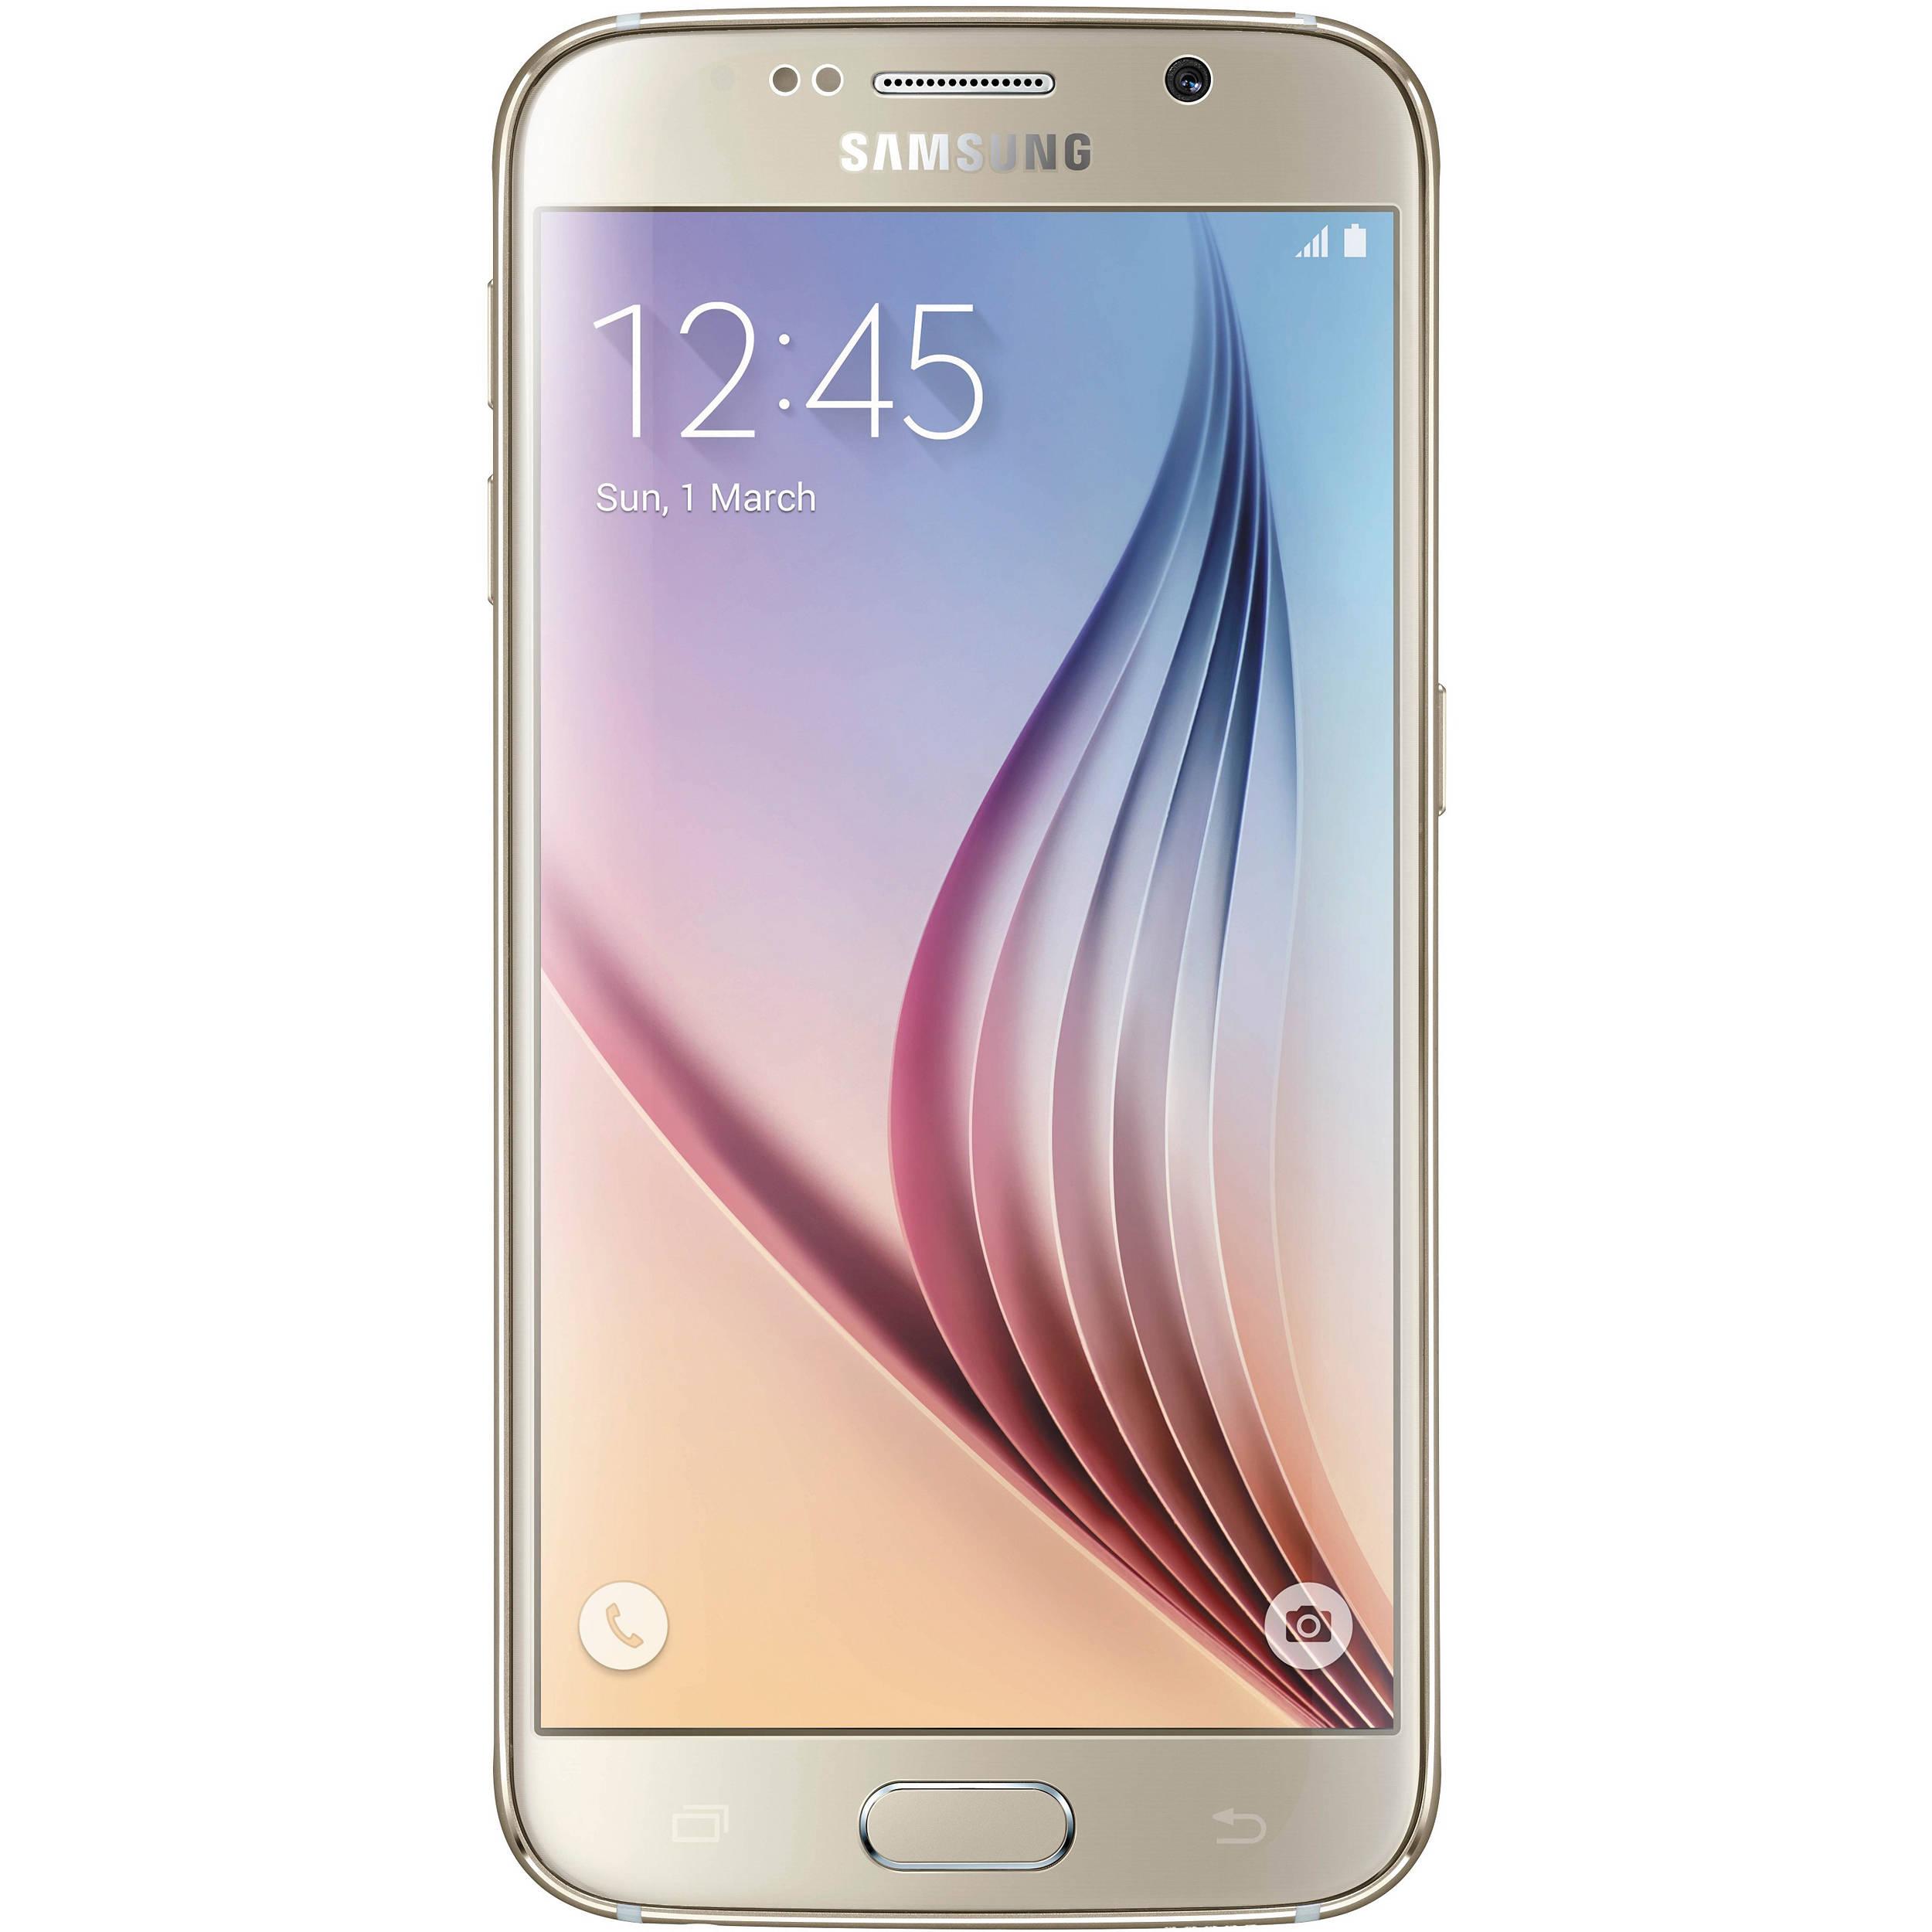 samsung galaxy s6 sm g920f 32gb smartphone g920f 32gb gold b h. Black Bedroom Furniture Sets. Home Design Ideas